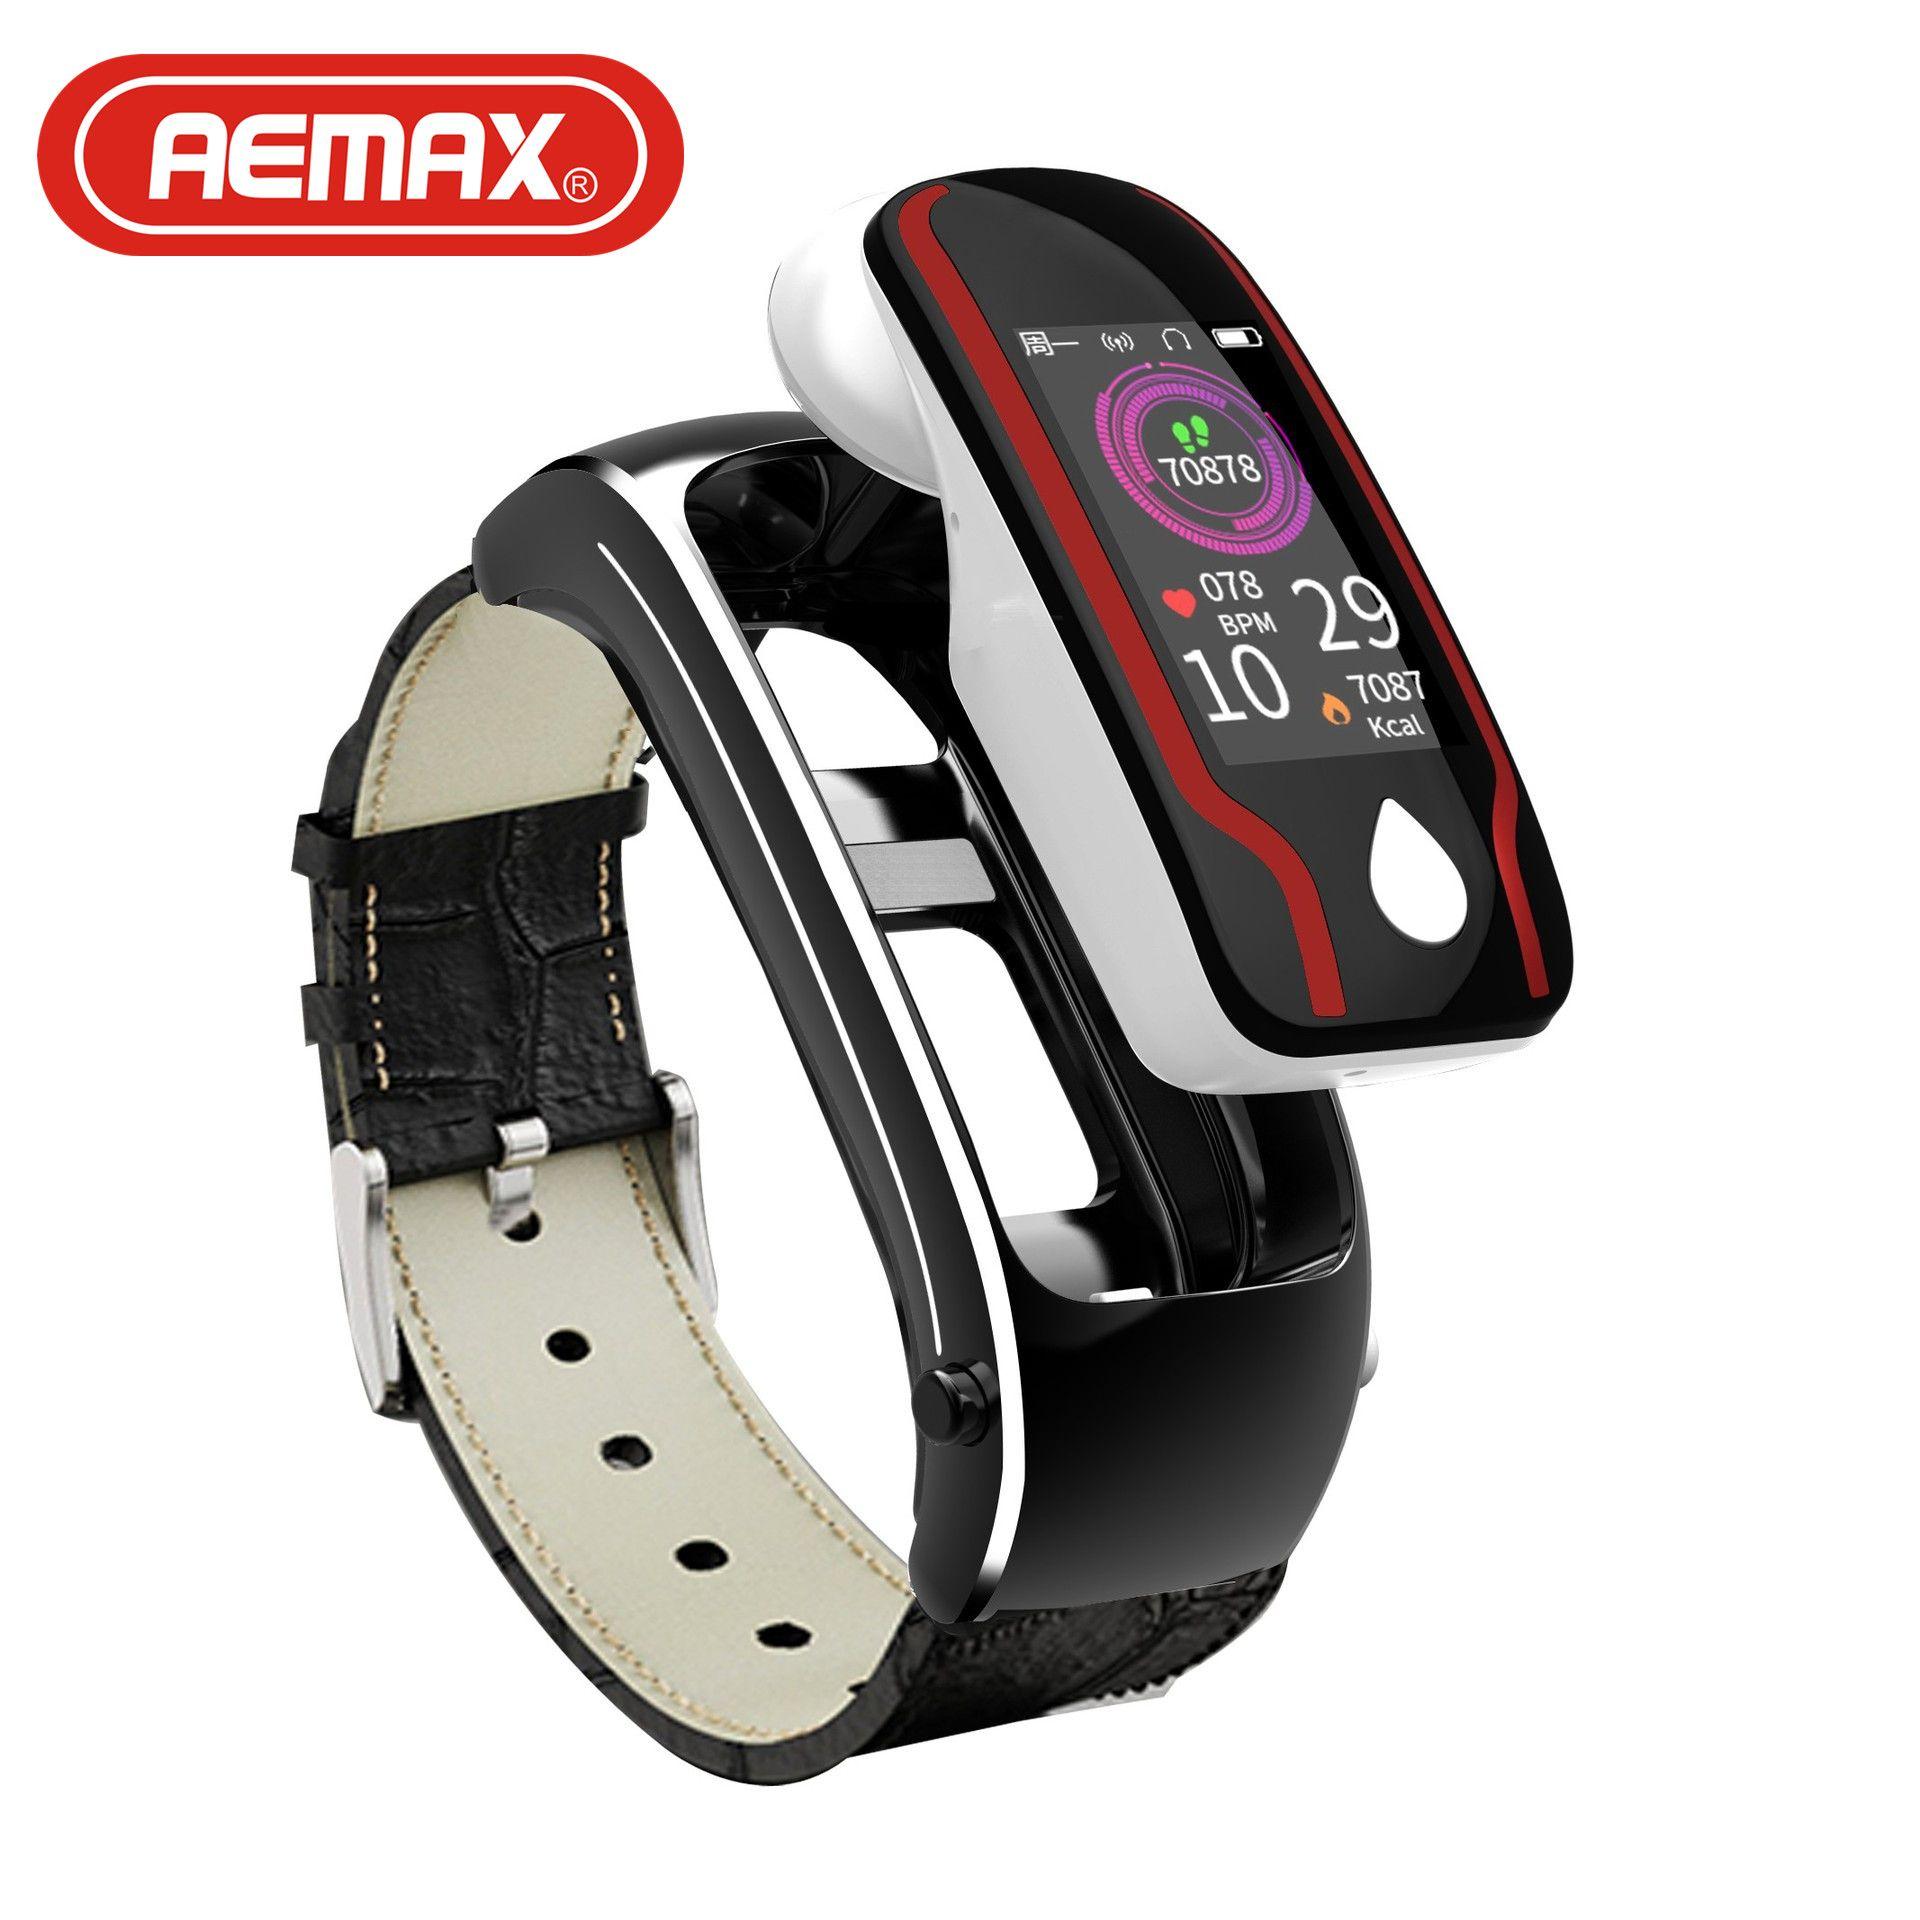 ZN120通话手环心率血压可冲洗IP68防水通话耳机手环信息提示运动手环